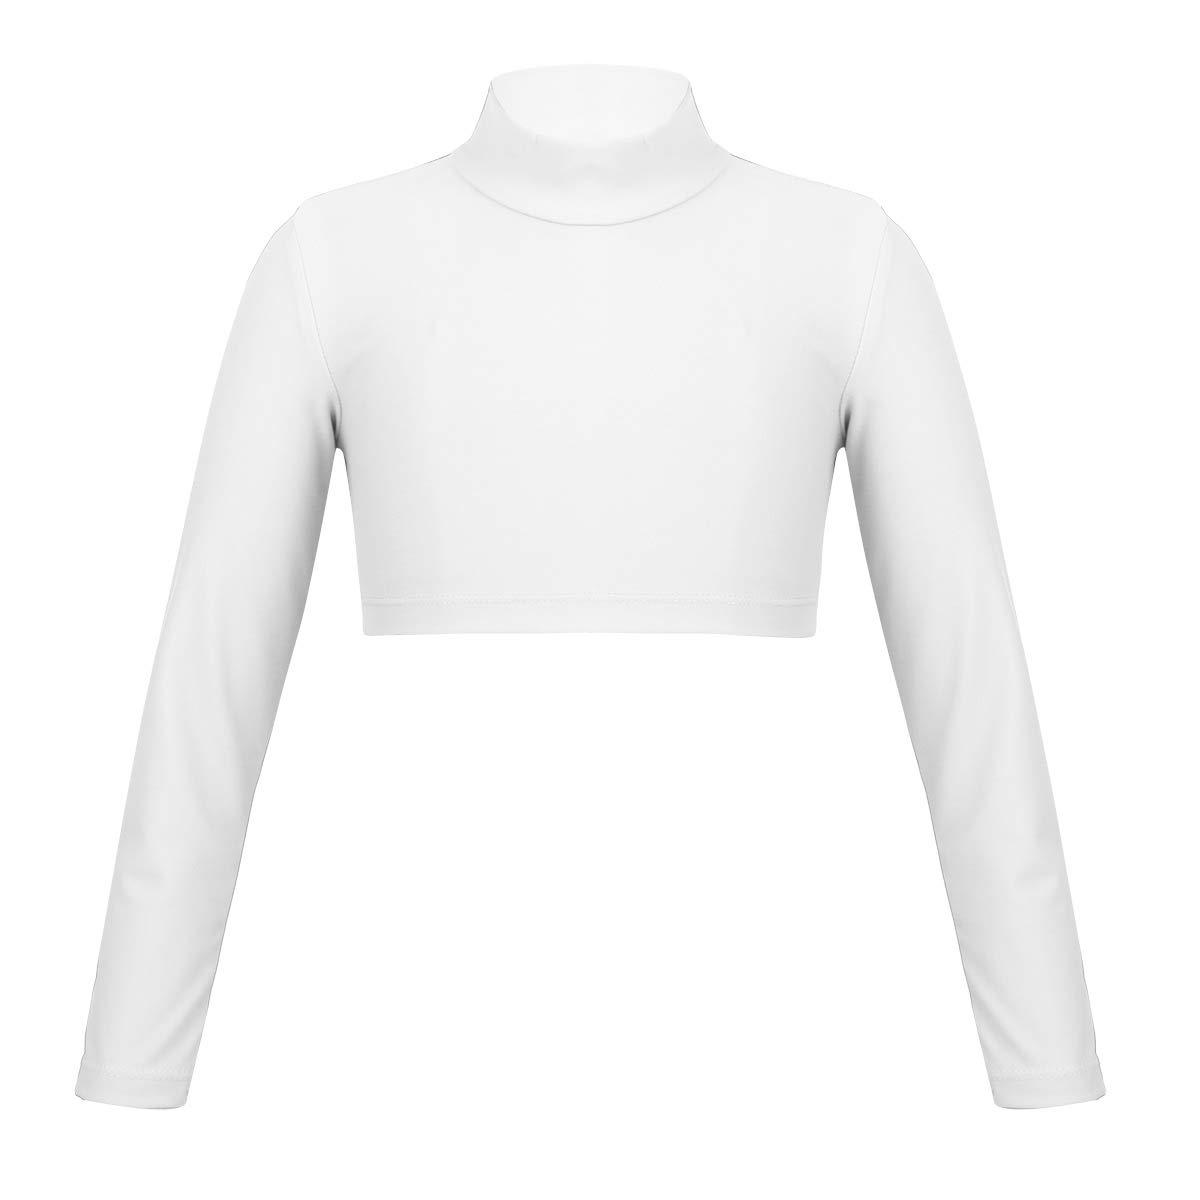 YiZYiF Kids Girls Basics Nylon Lcyra Sportswear Athletic Long Sleeve Stretch Short Polo Neck T-Shirt Crop Top